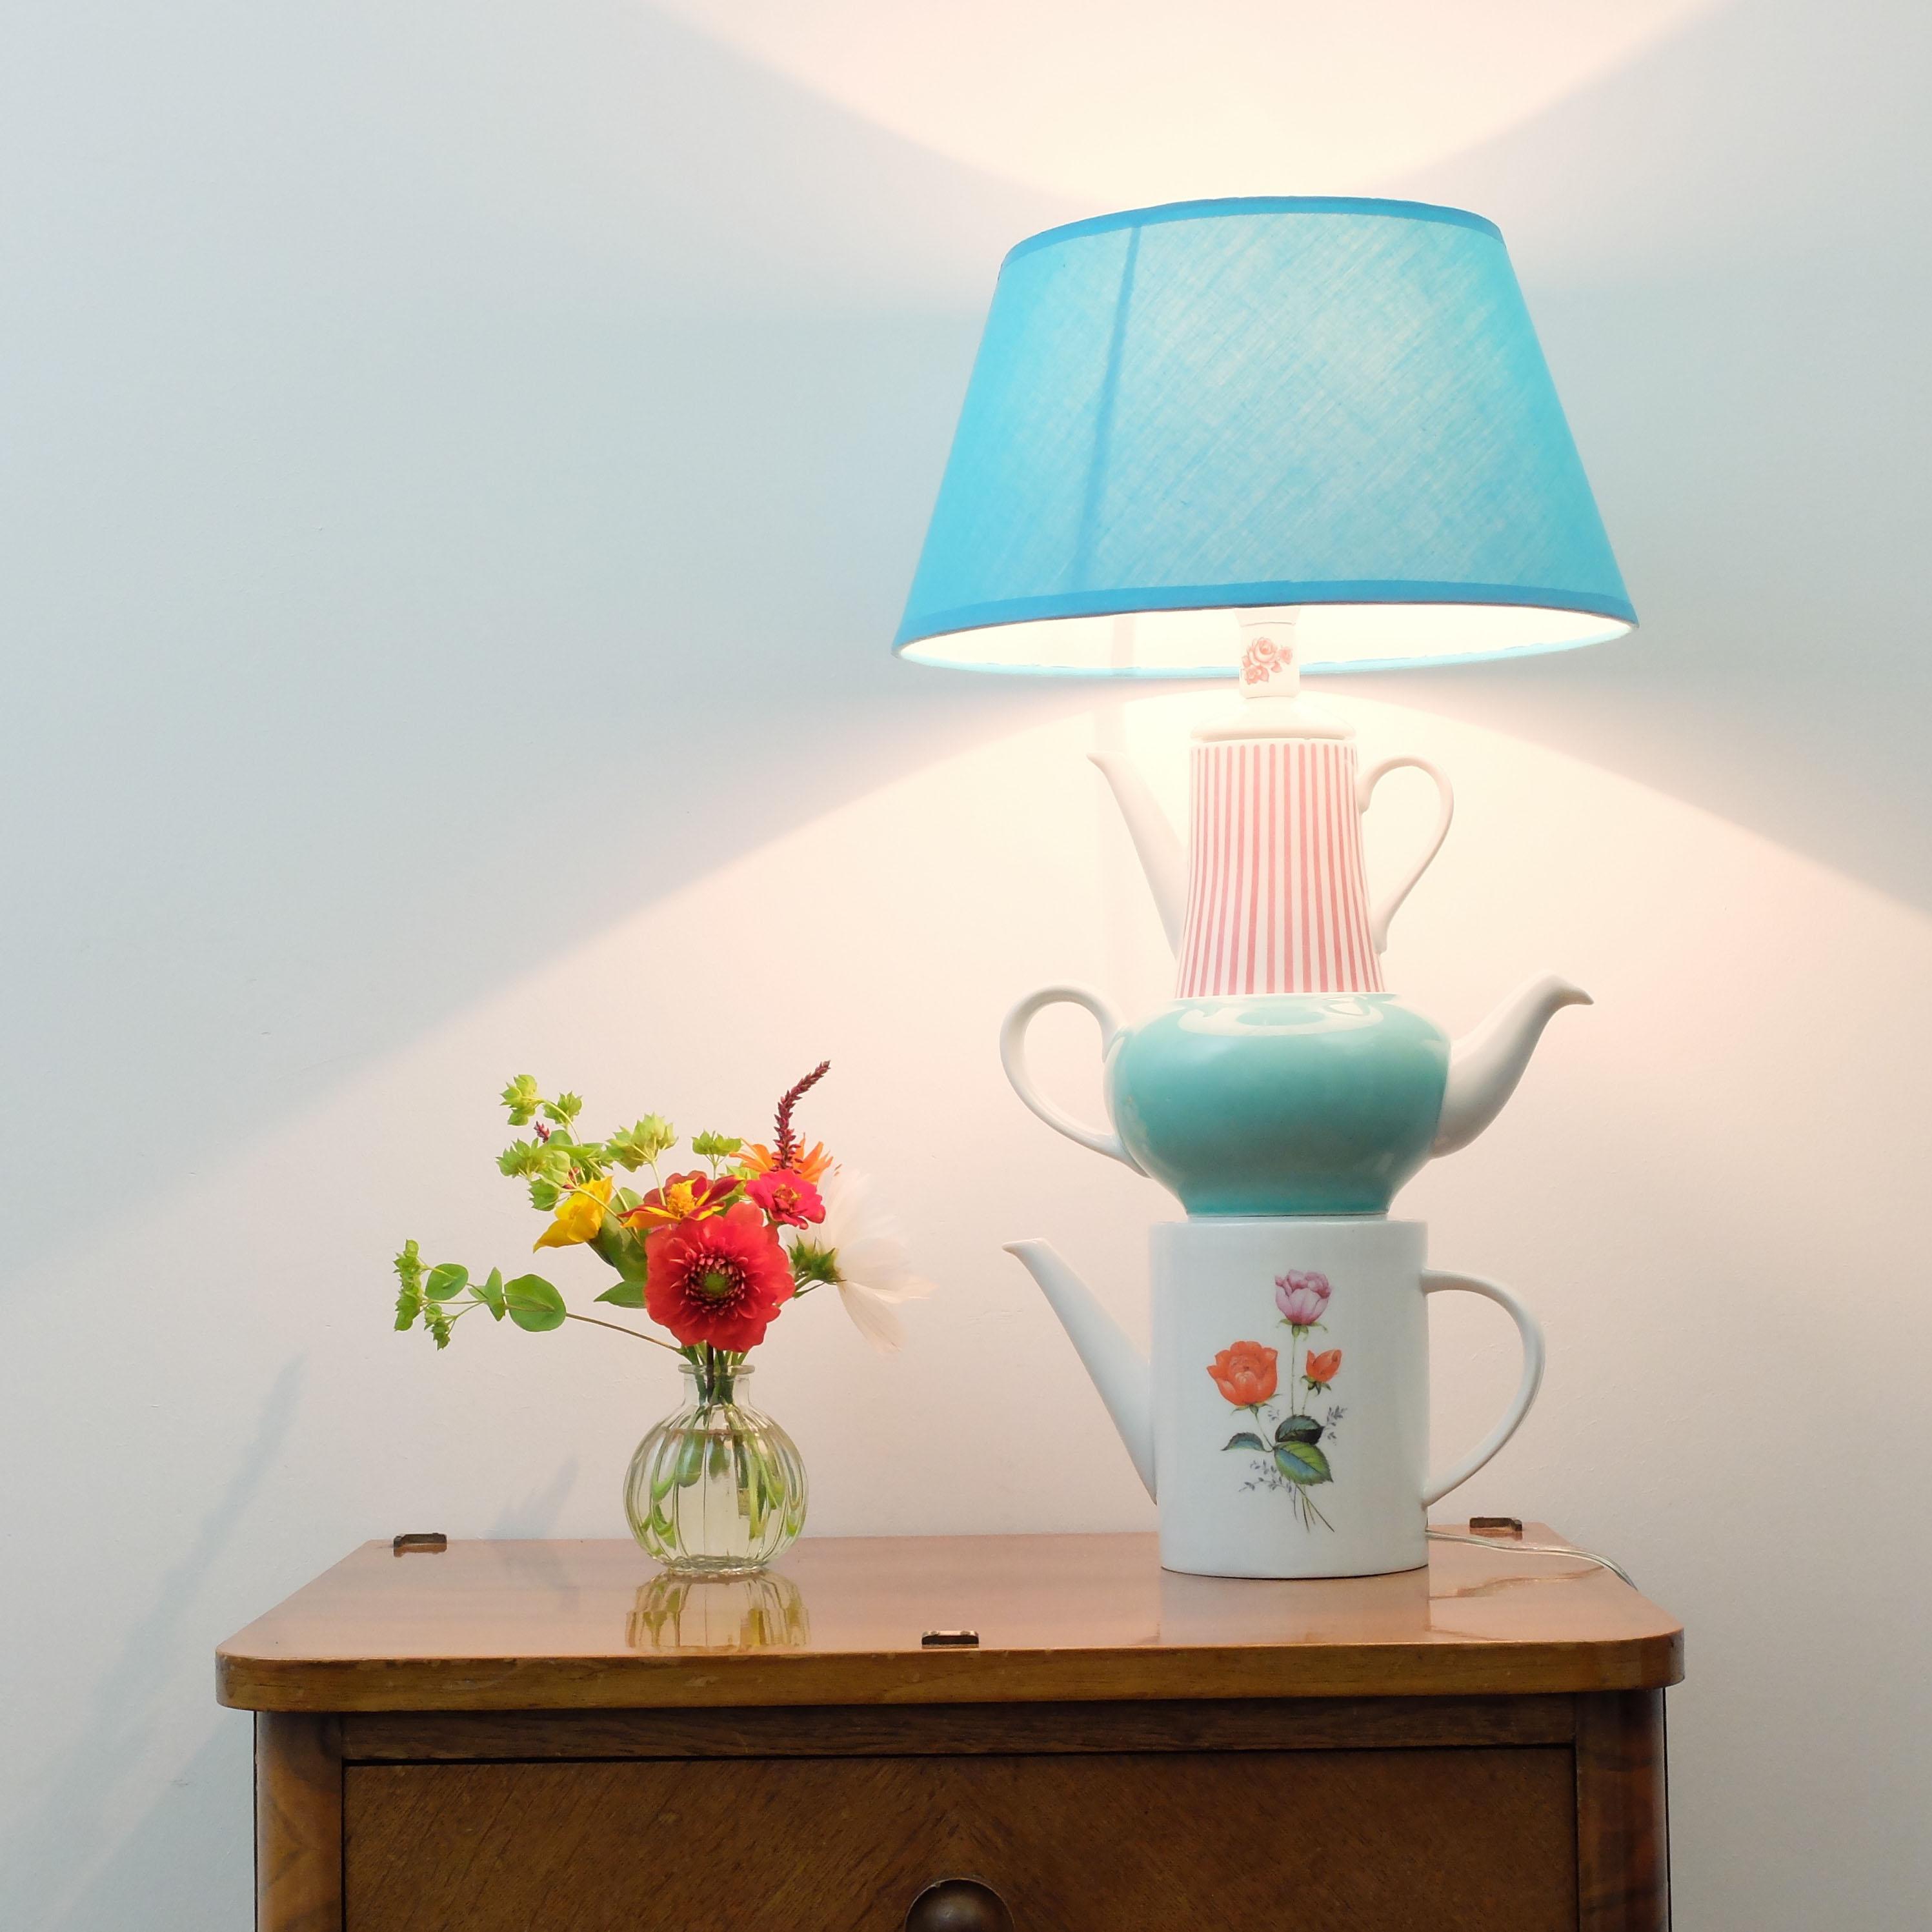 Theepottenlamp